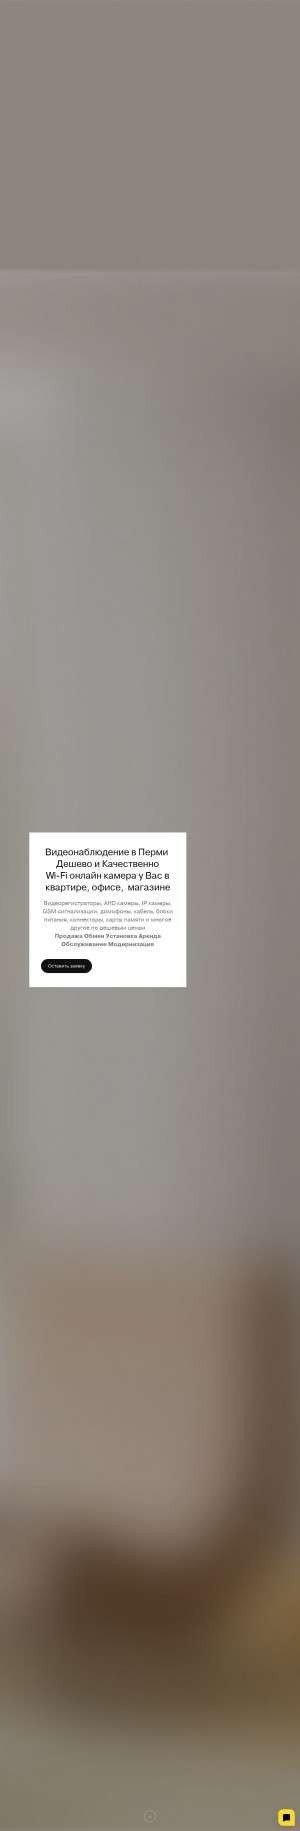 Предпросмотр для videonabludenie59.ru — Видеонаблюдение59